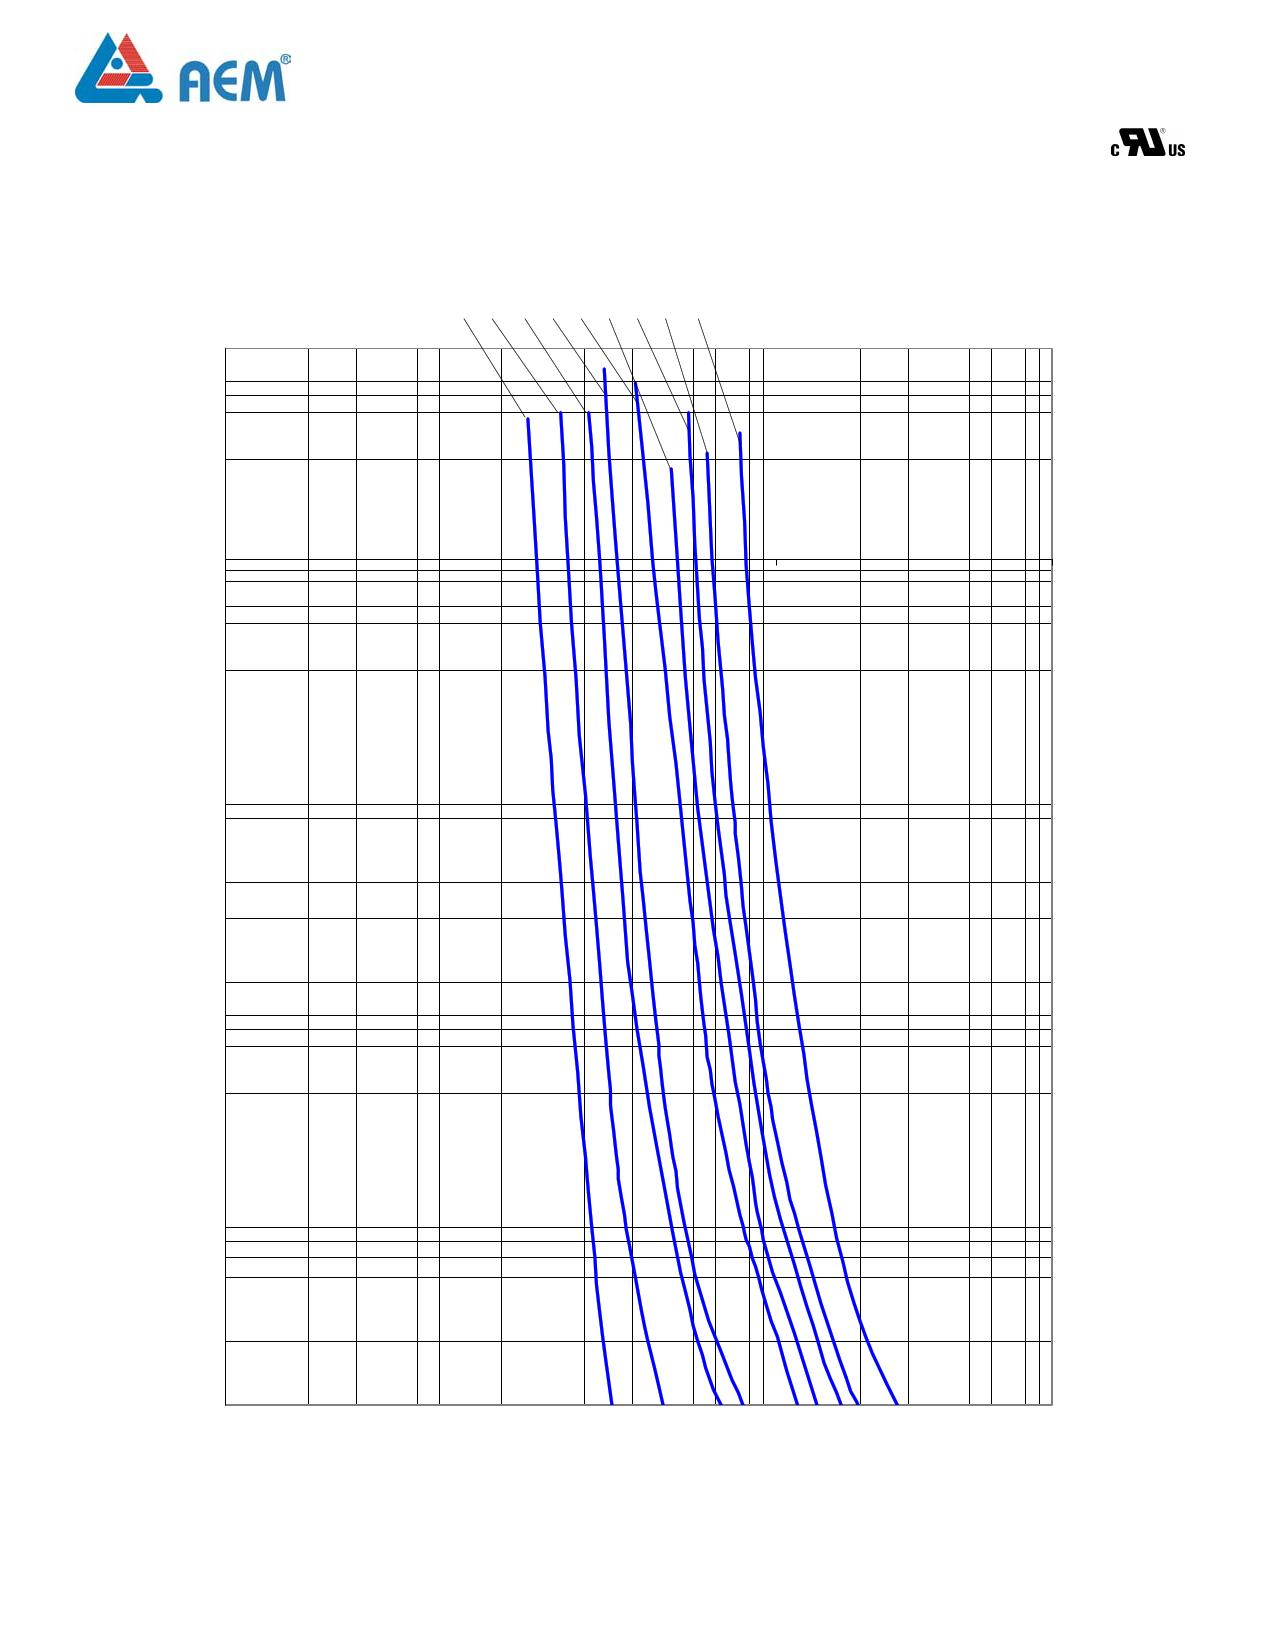 F0603FA2500V032T arduino